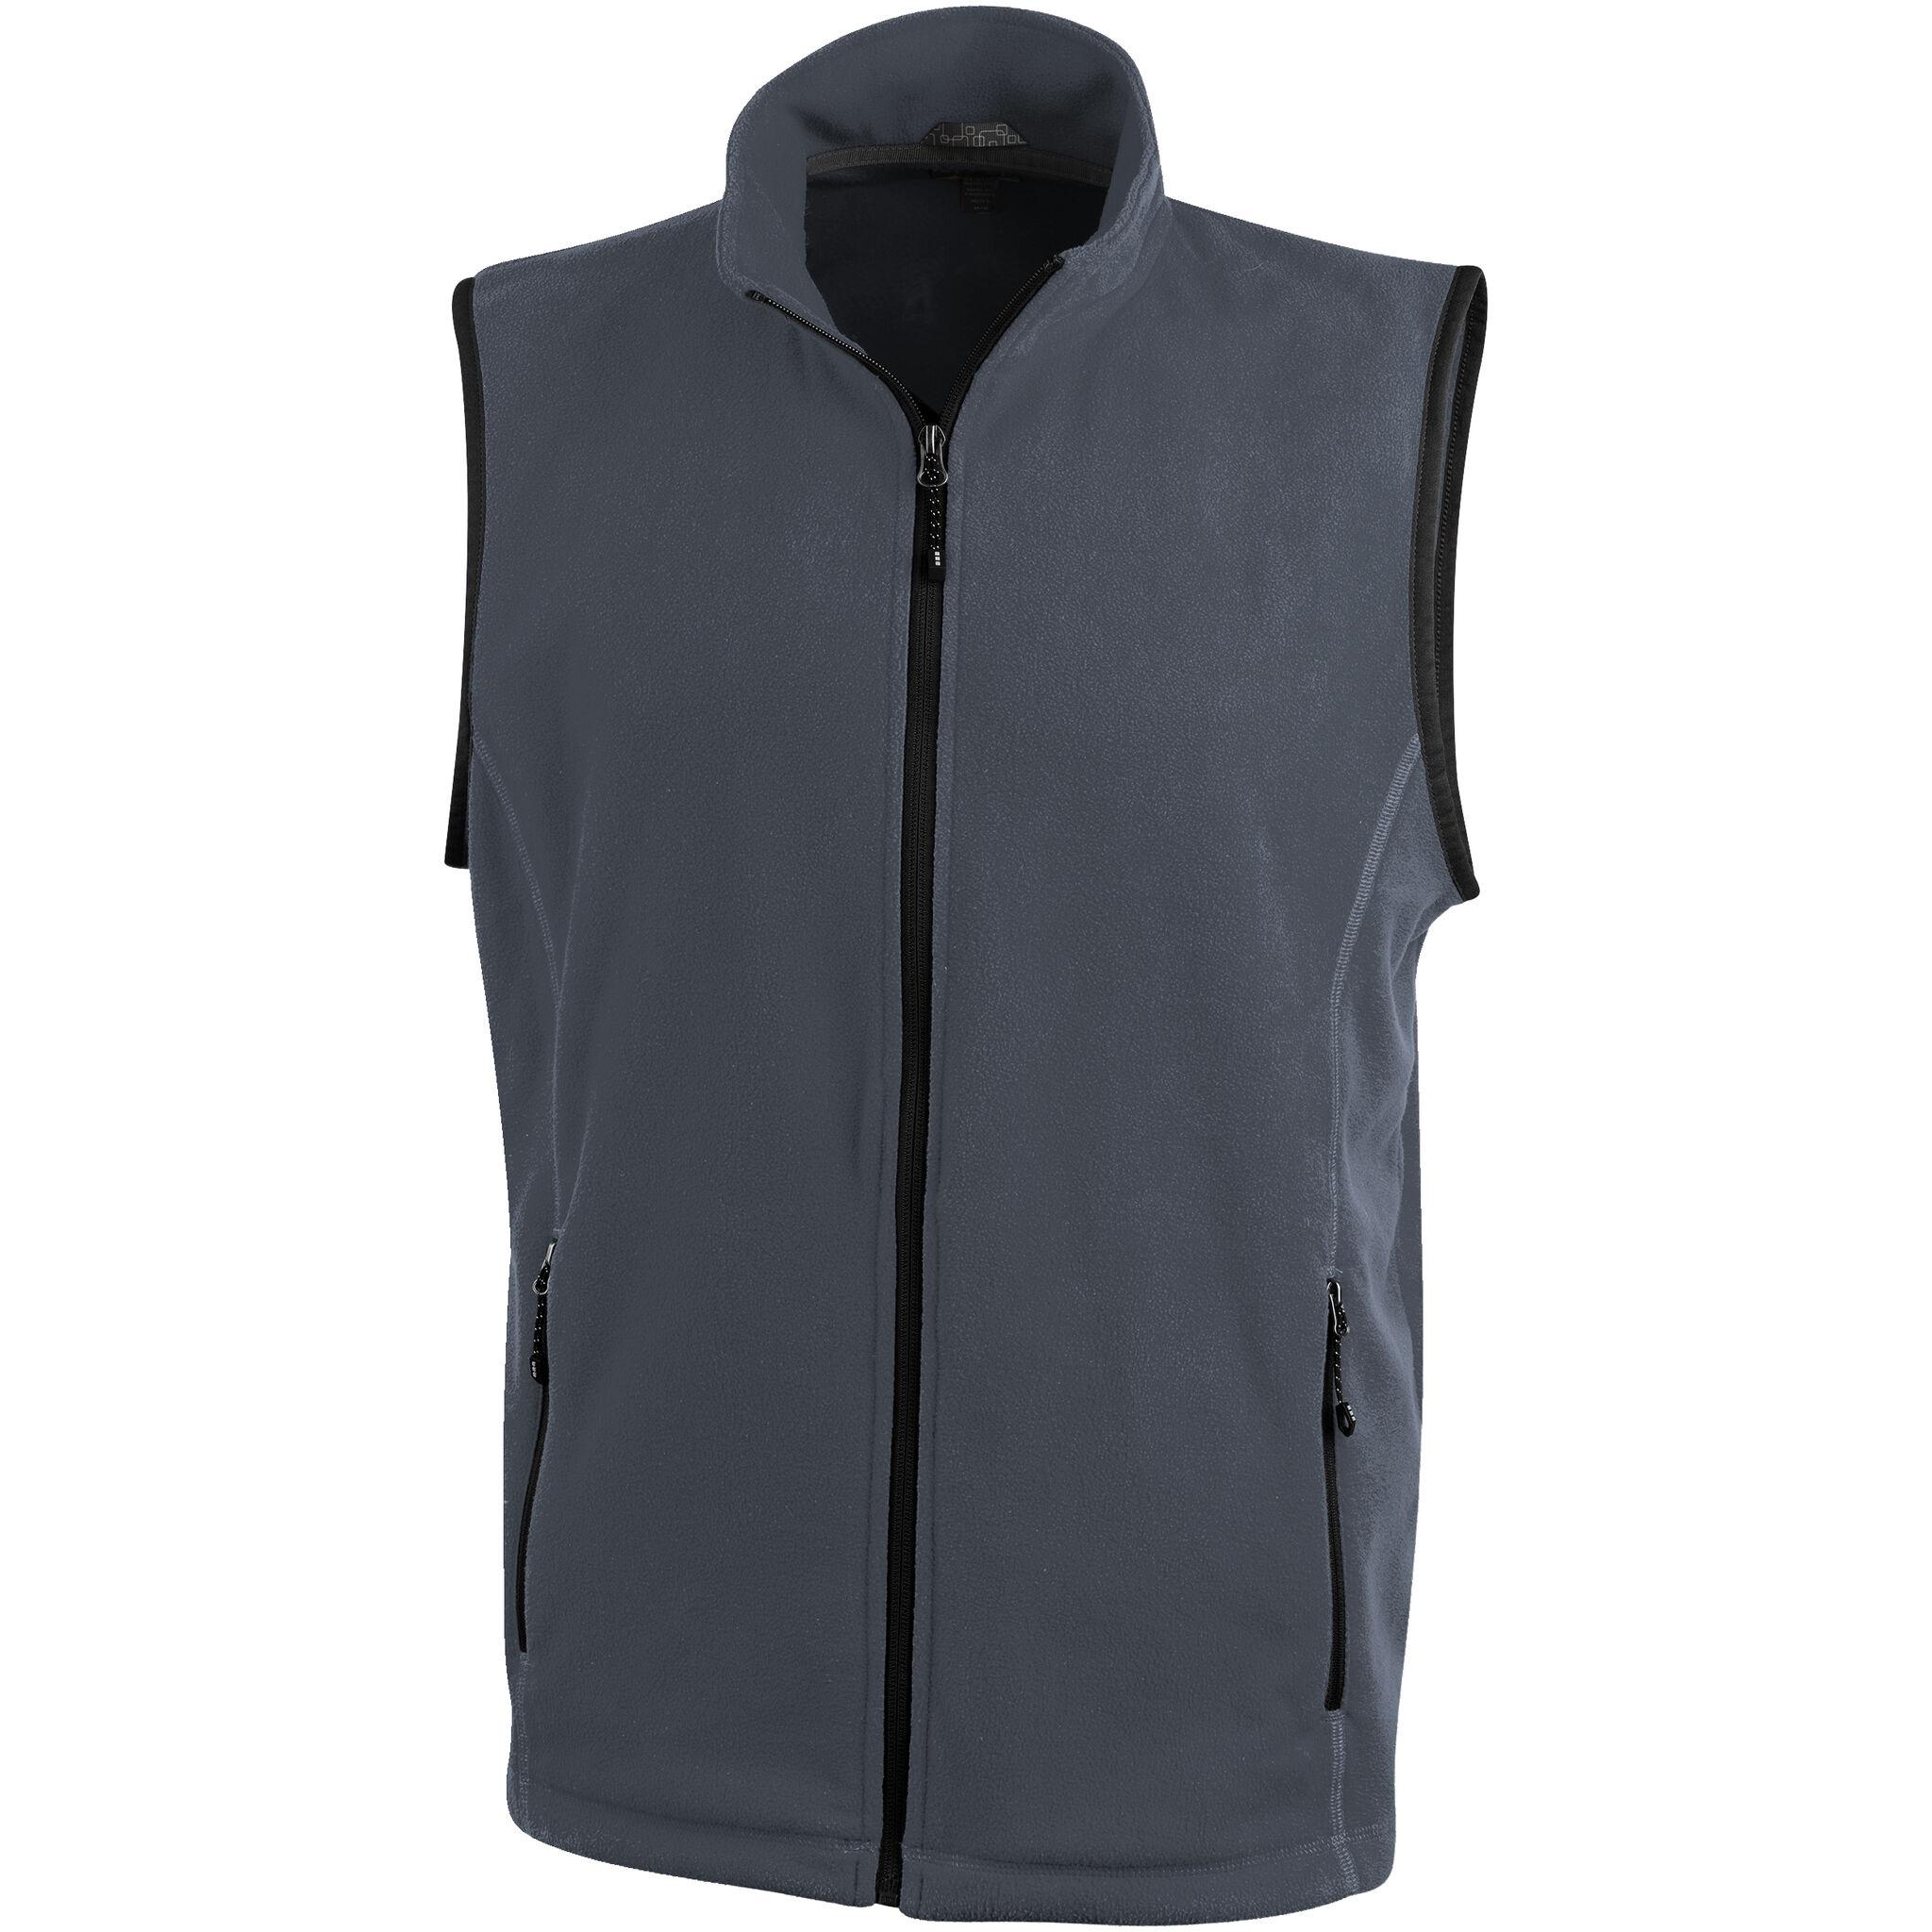 Elevate Body Tyndall Micro Fleece Pour Homme (Gris tempête) - UTPF1936